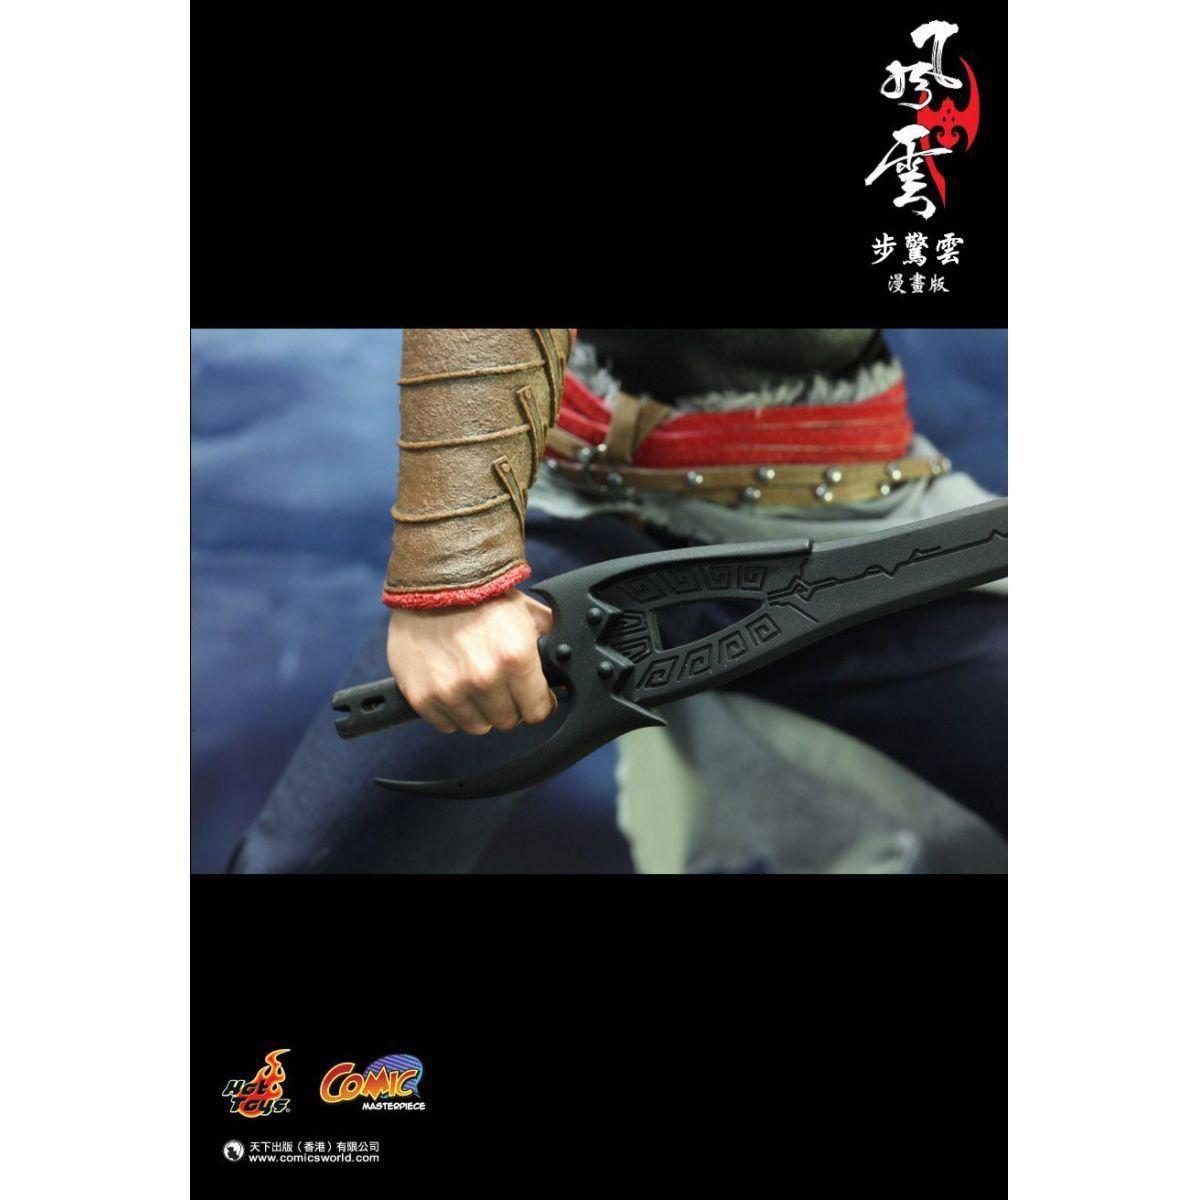 Boneco Cloud: Os Cavaleiros da Tempestade (The Storm Riders) Escala 1/6 - Hot Toys - CD